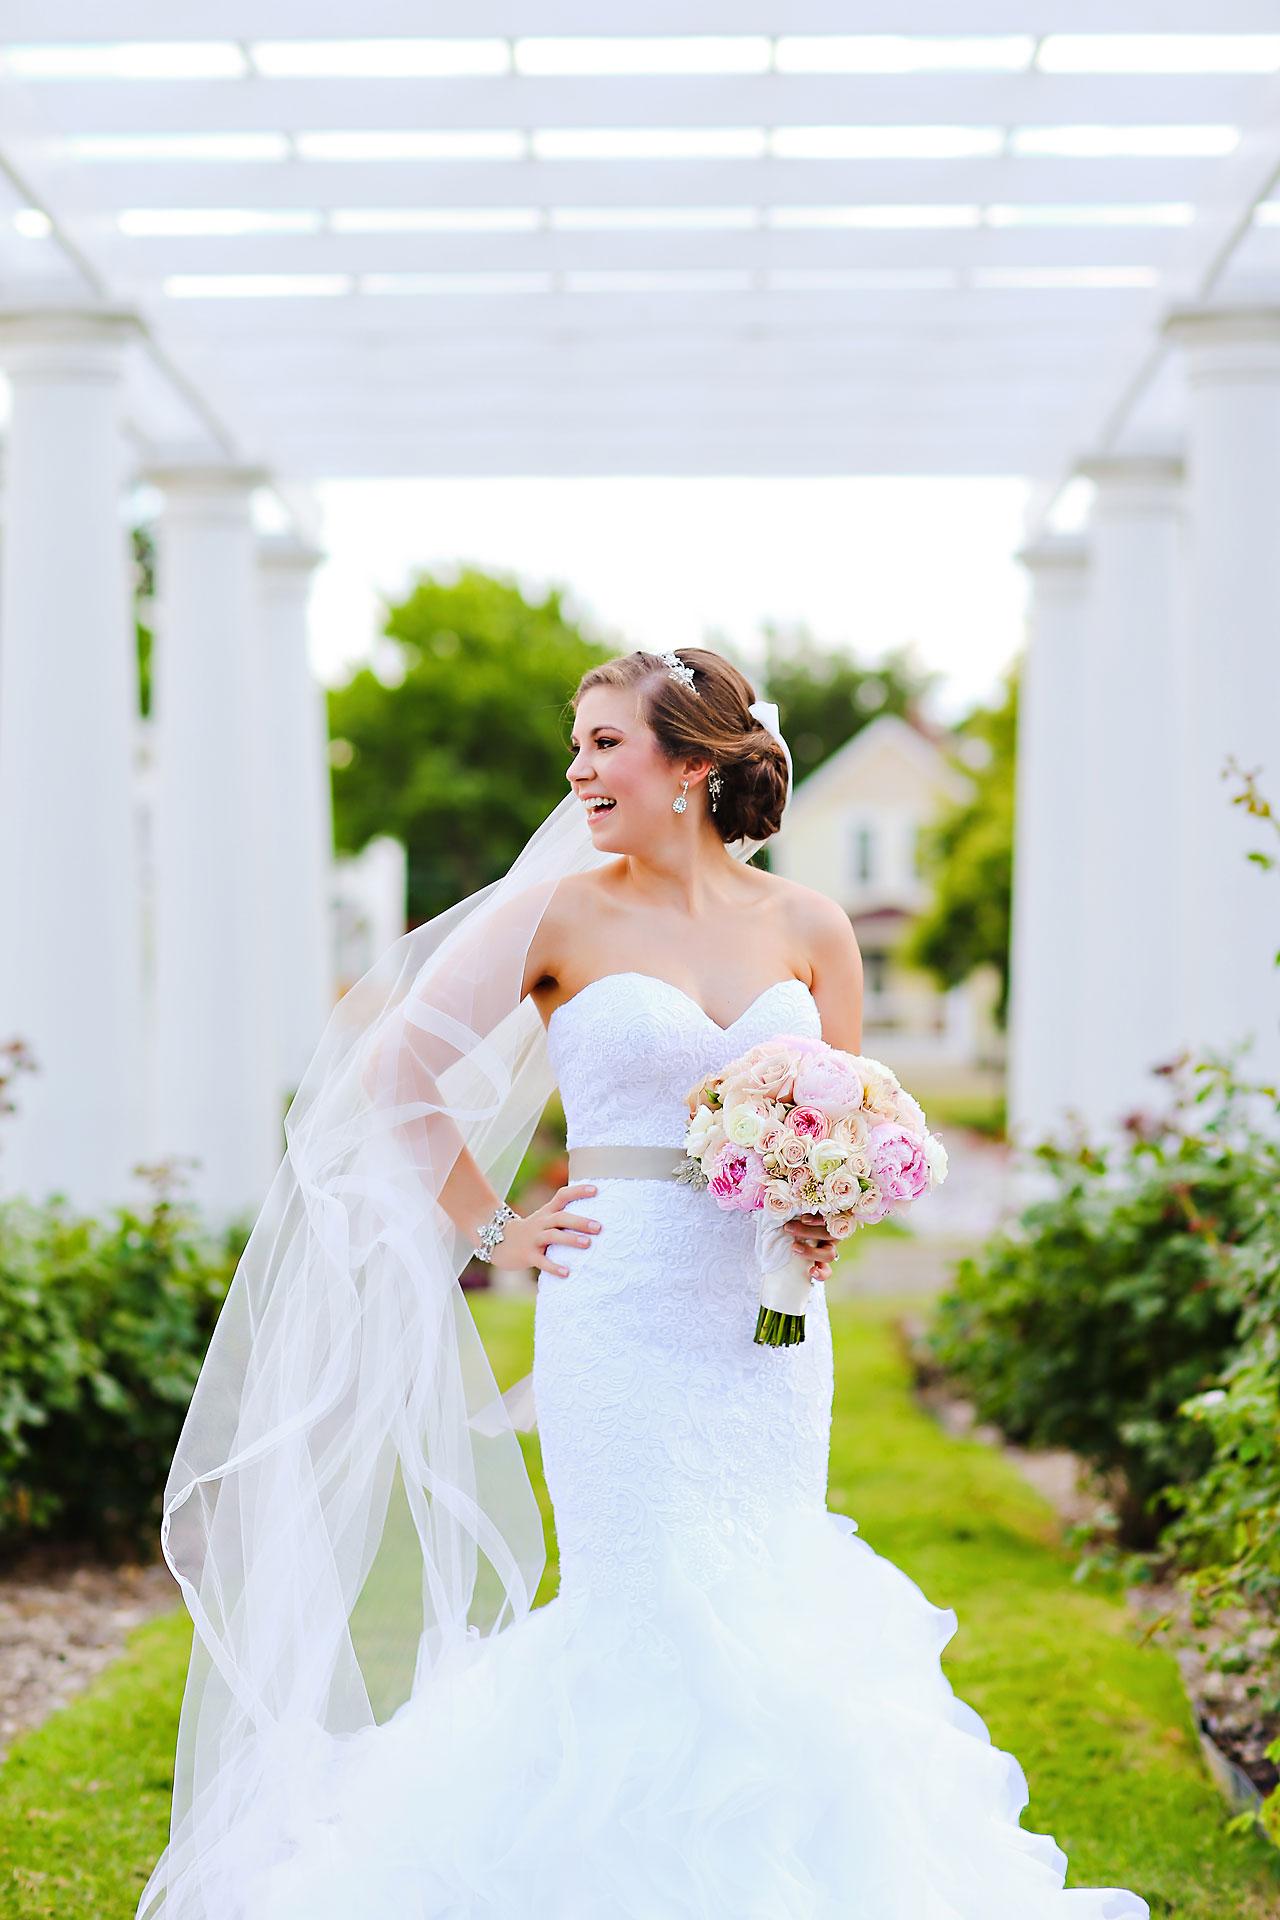 Emmy Benji Emyprean Fort Wayne Wedding 089